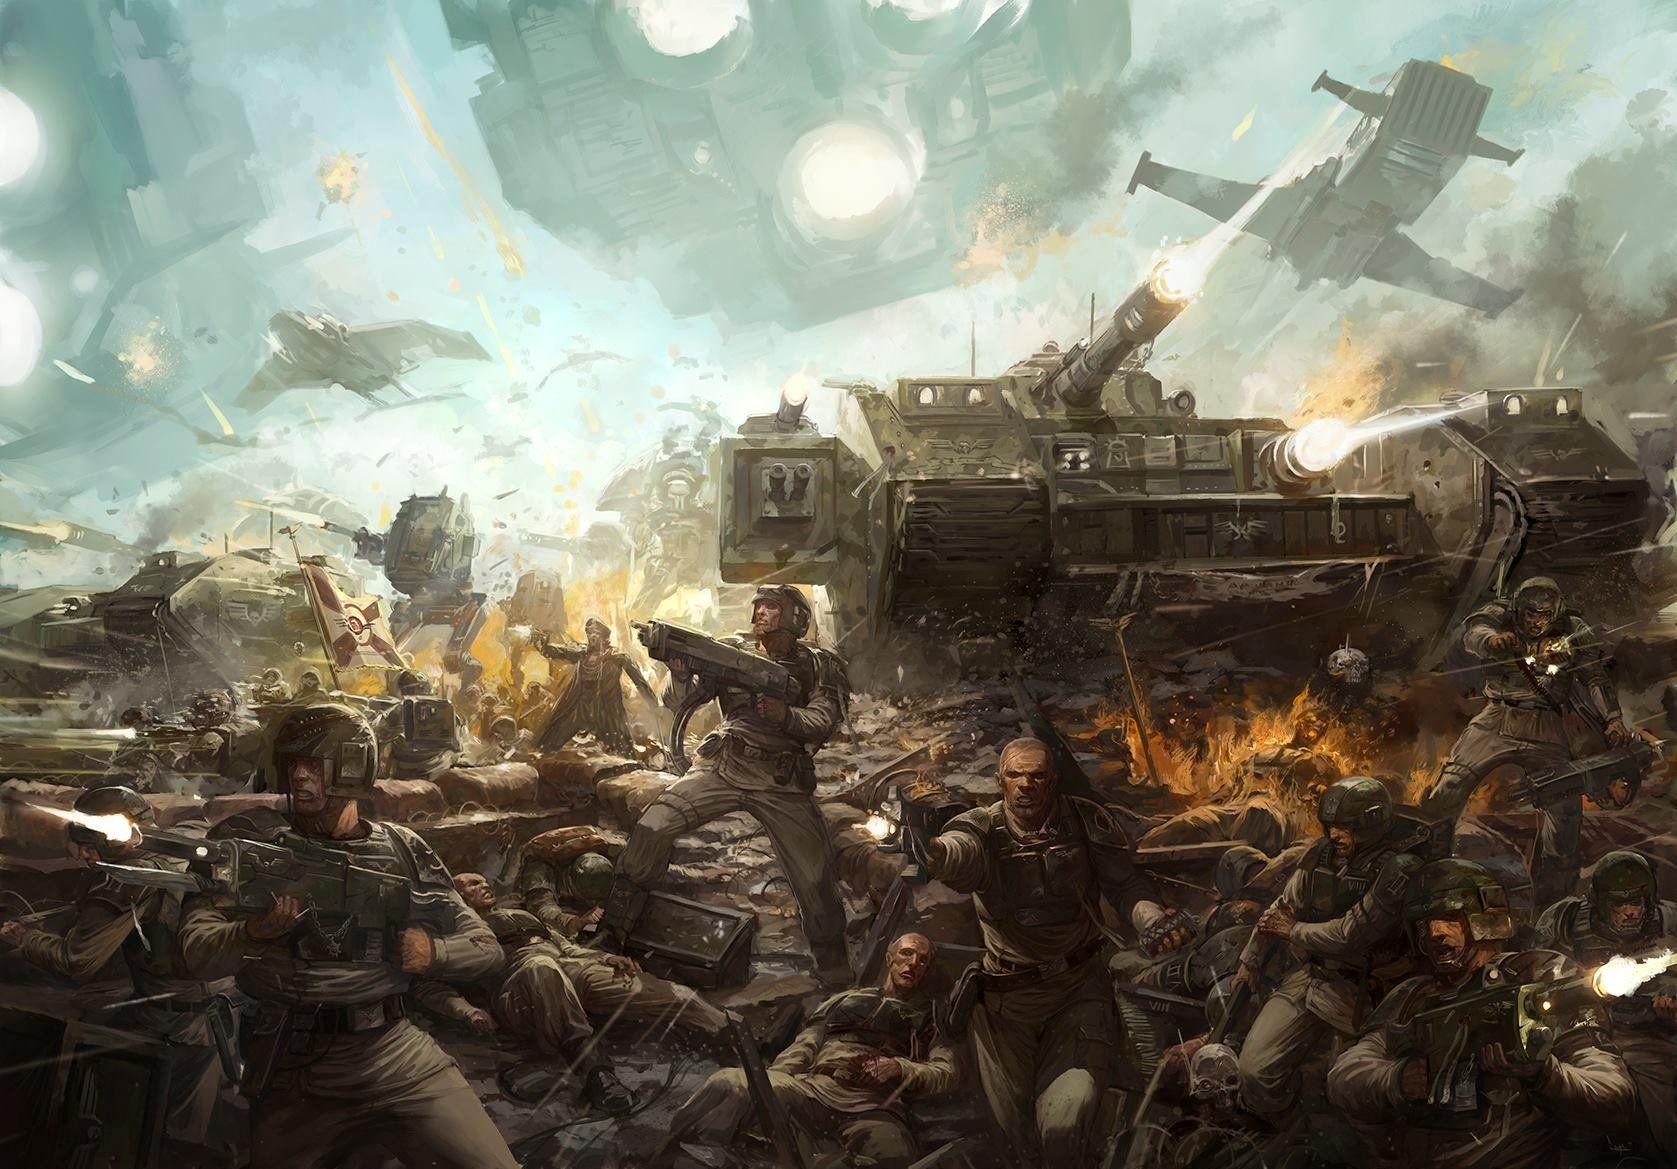 40k Wallpapers Warhammer Art Warhammer 40000 40k